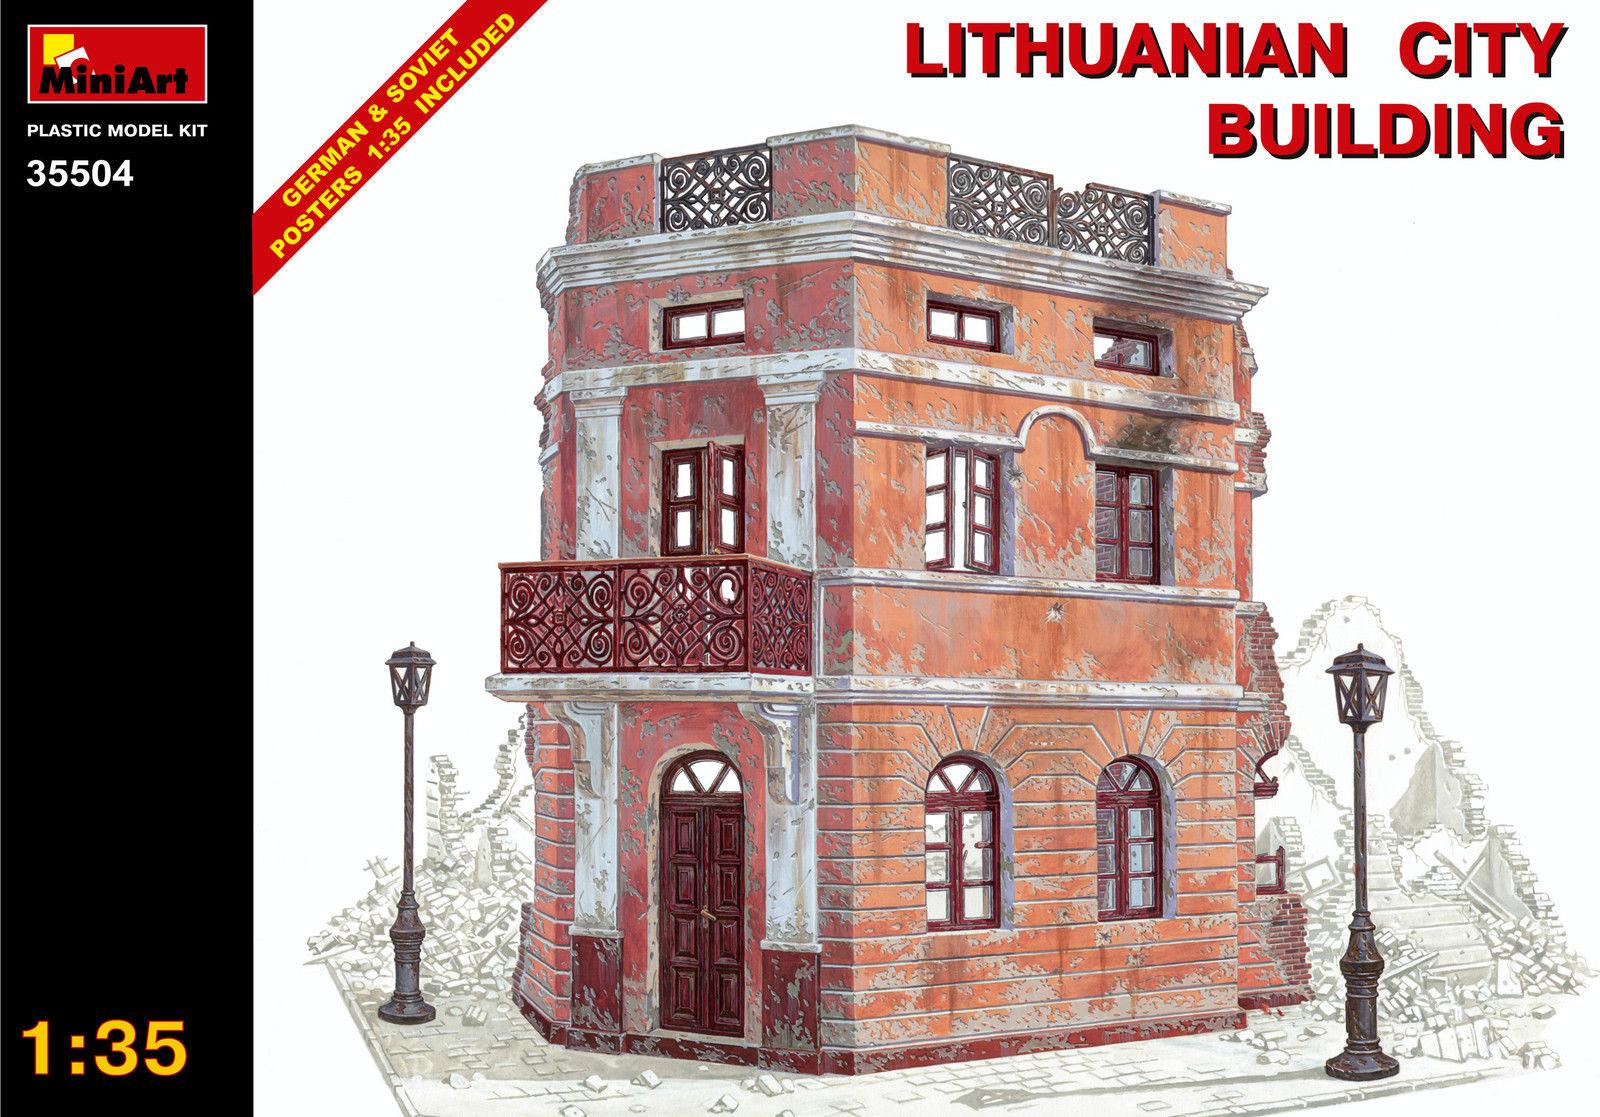 Lithuanian City Building